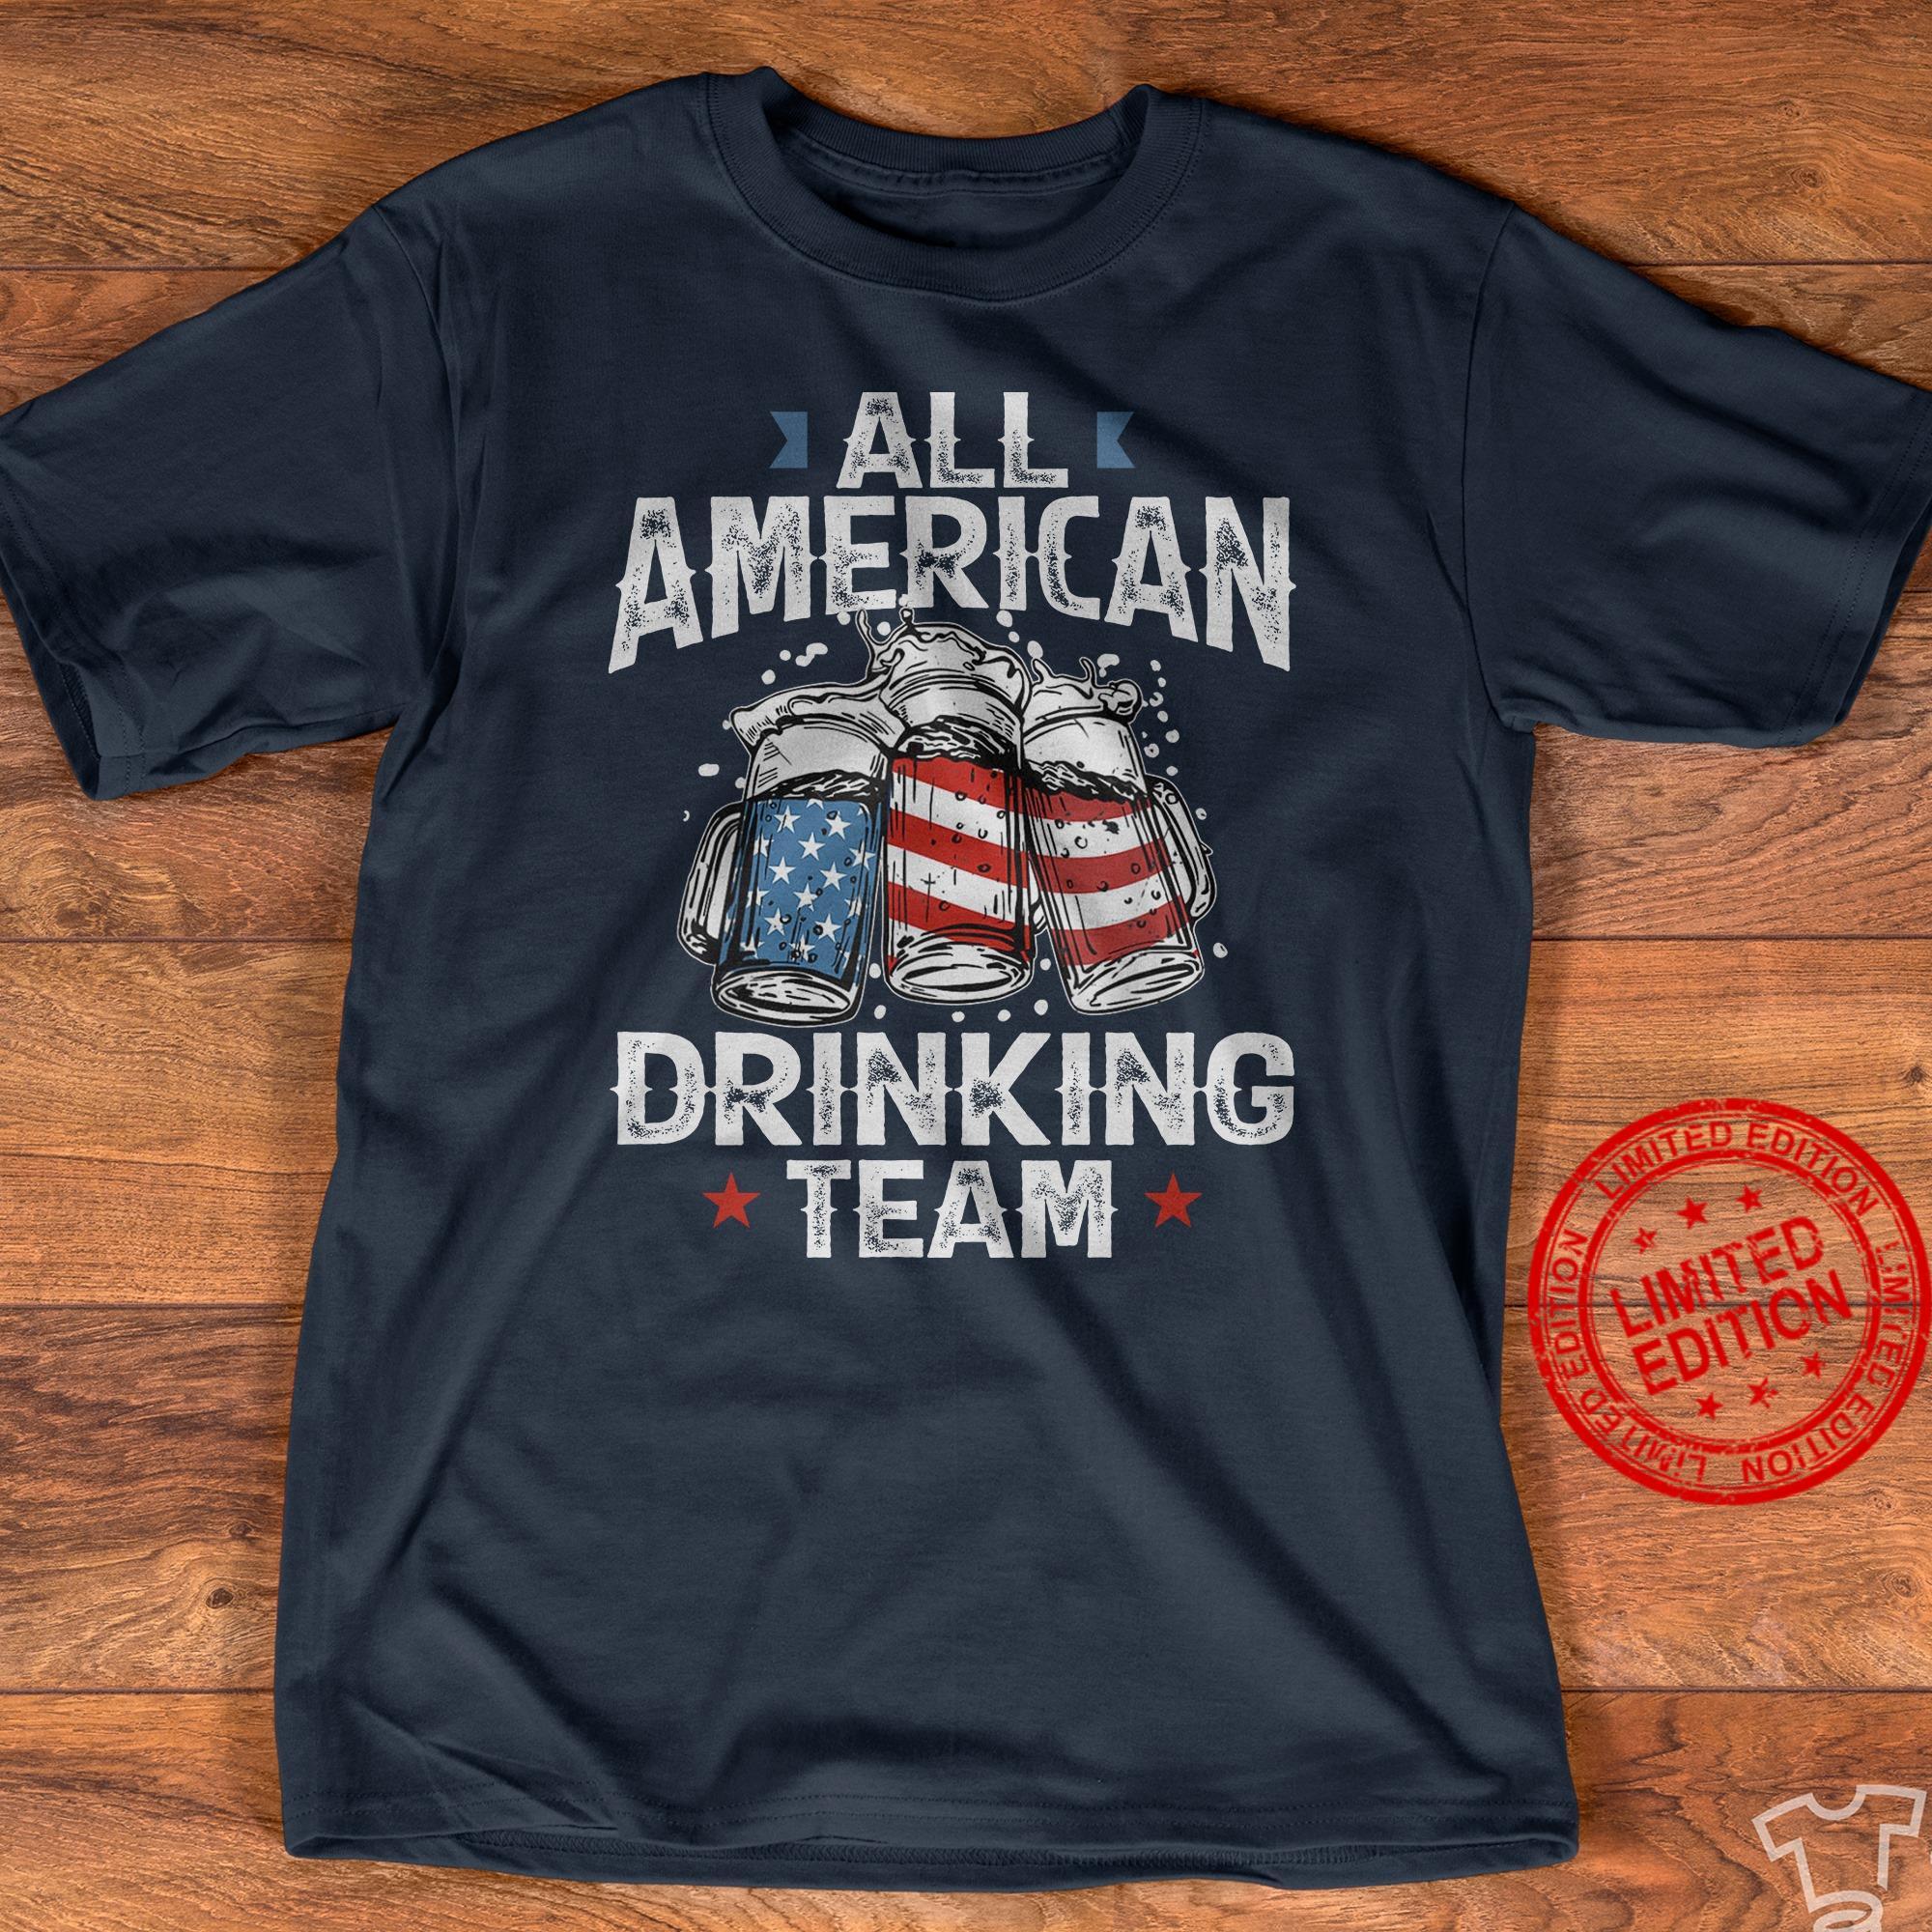 All American Drinking Team Shirt